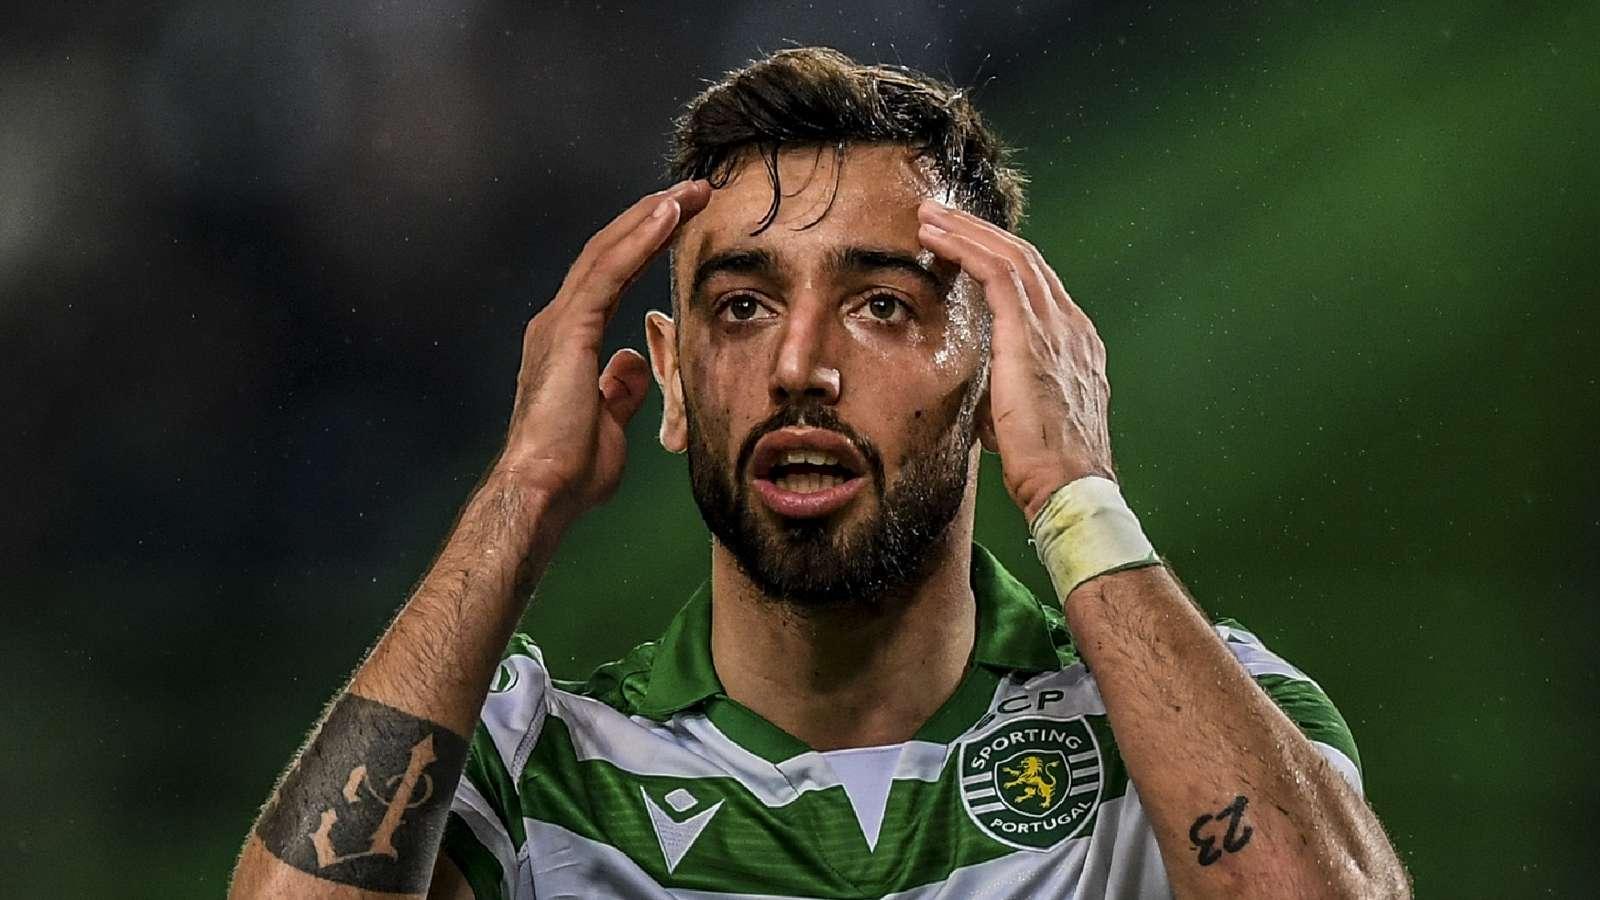 منچستریونایتد-پرتغال-اسپورتینگ لیسبون-Sporting CP-Portugal-Manchester United